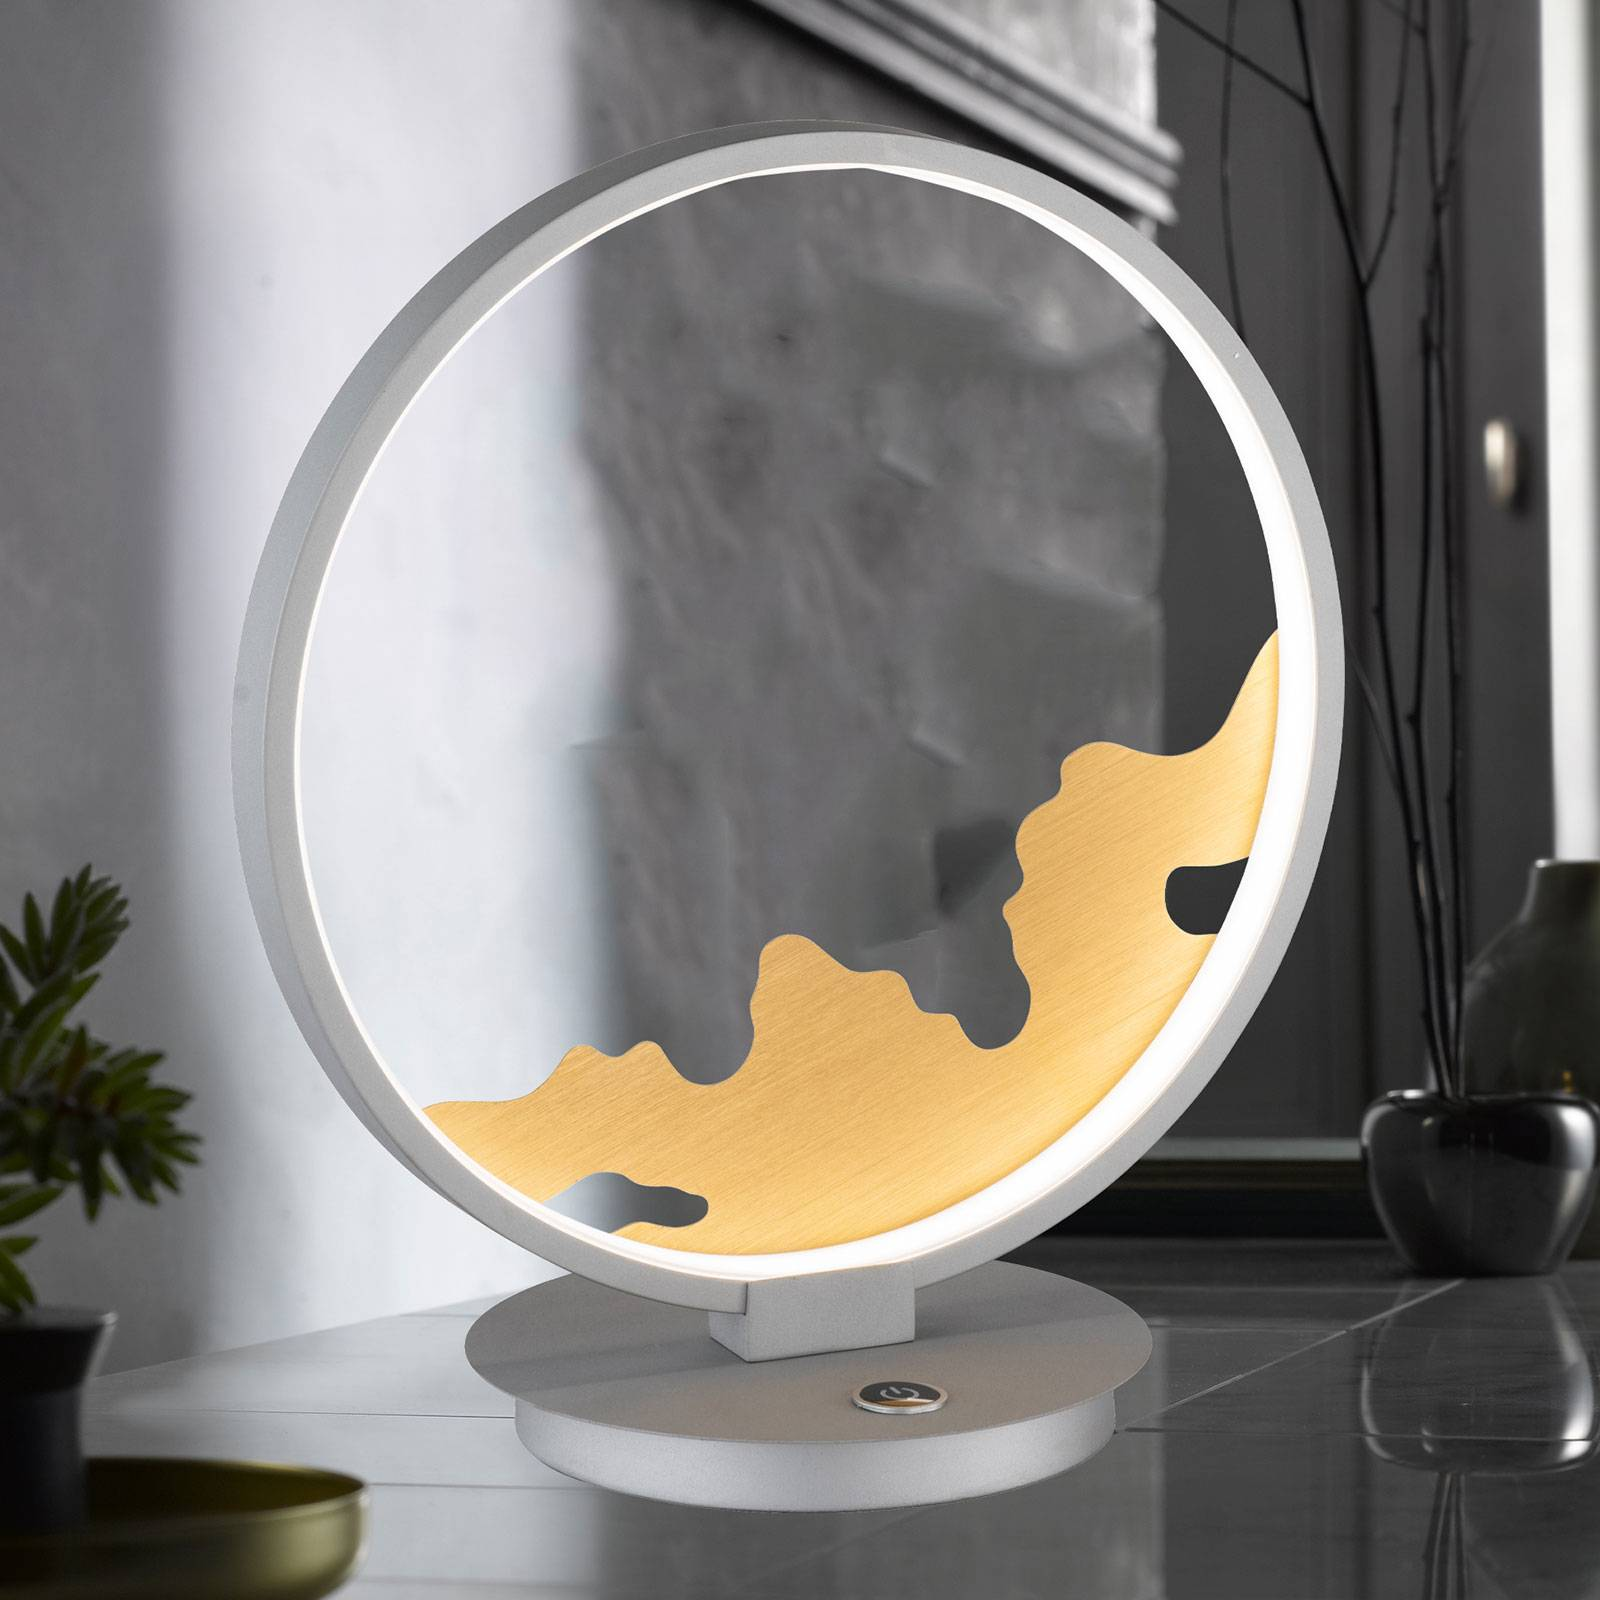 LED tafellamp Modesto met gouden decoratie